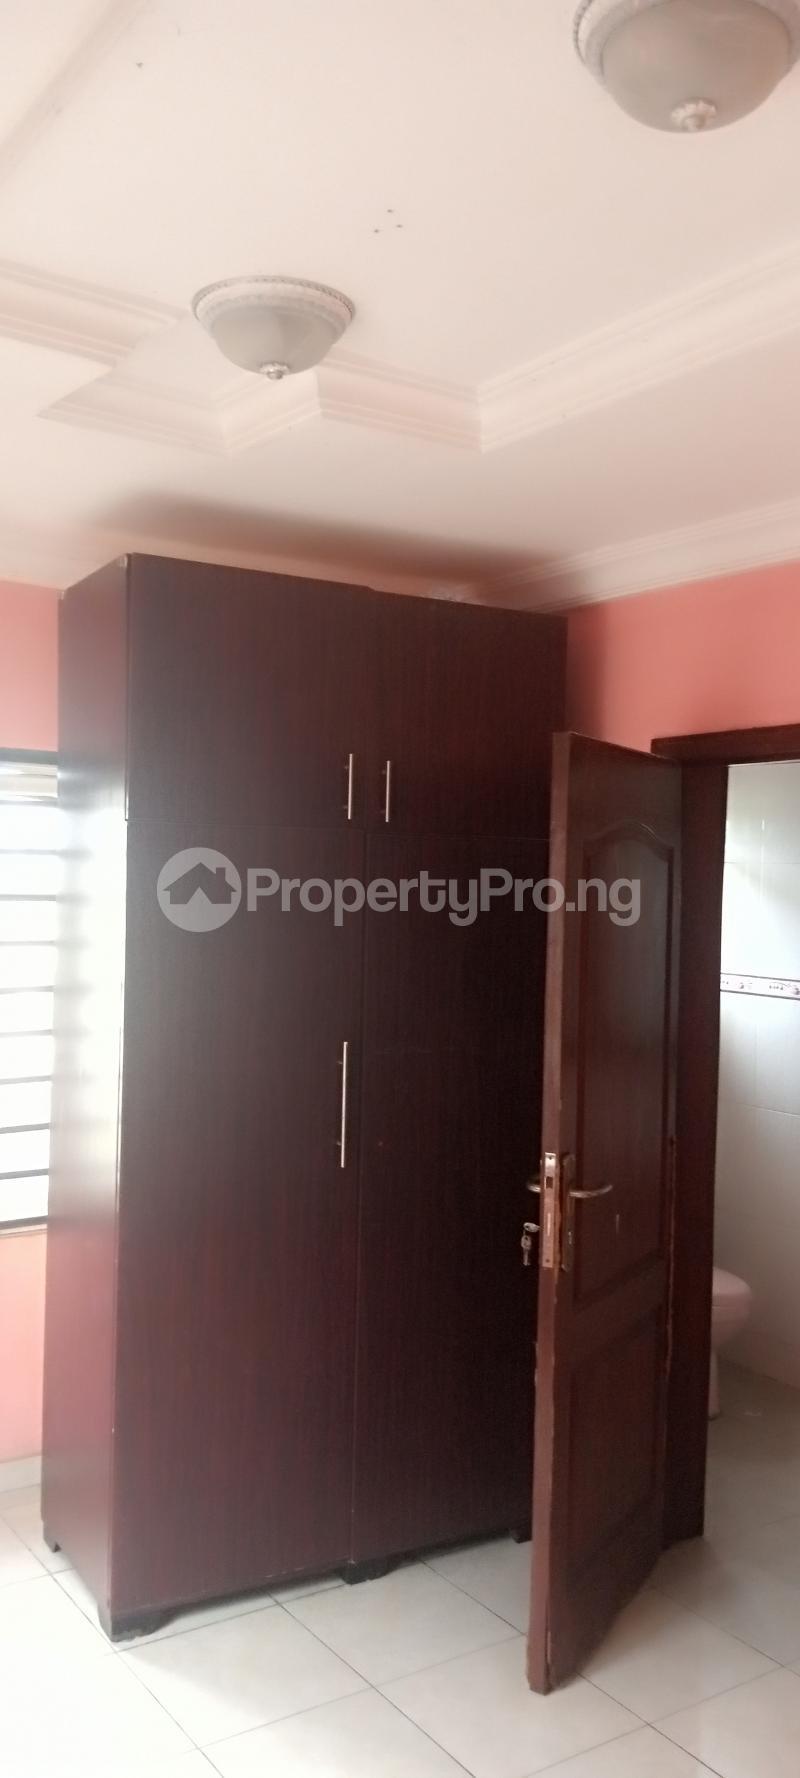 5 bedroom House for rent Estate drive Omole phase 2 Ojodu Lagos - 17